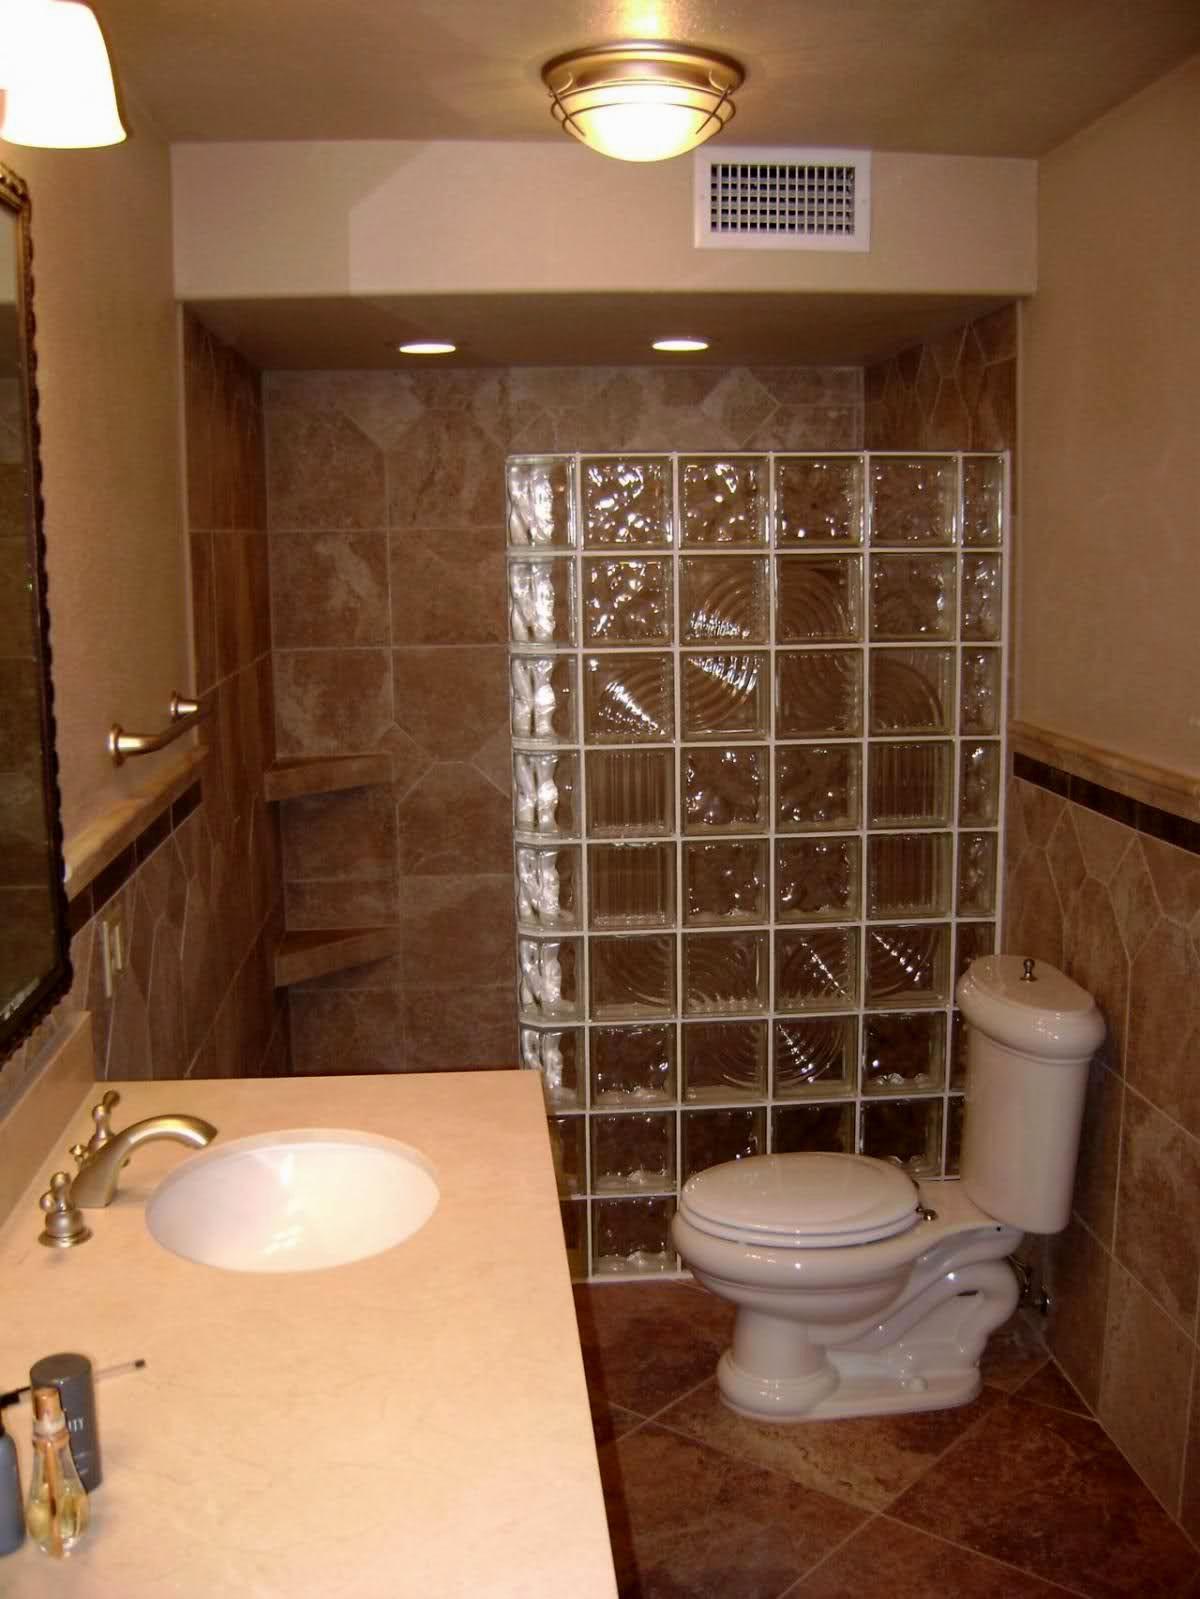 fresh storage ideas for small bathrooms pattern-Cute Storage Ideas for Small Bathrooms Decoration